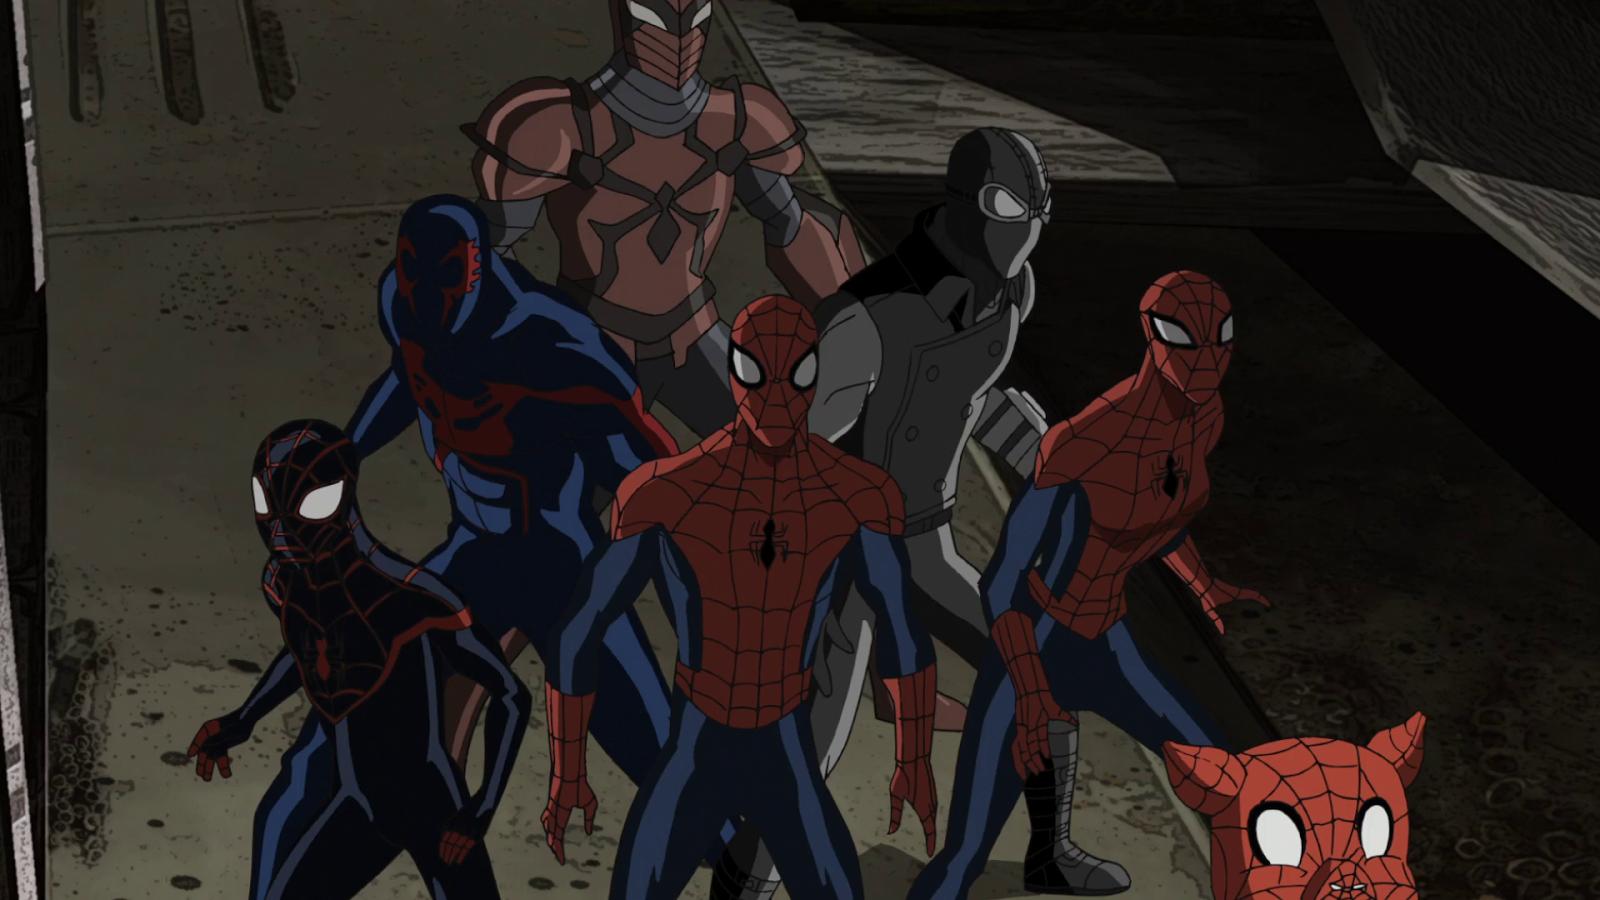 Dark•Heritage: Ultimate Spider-man